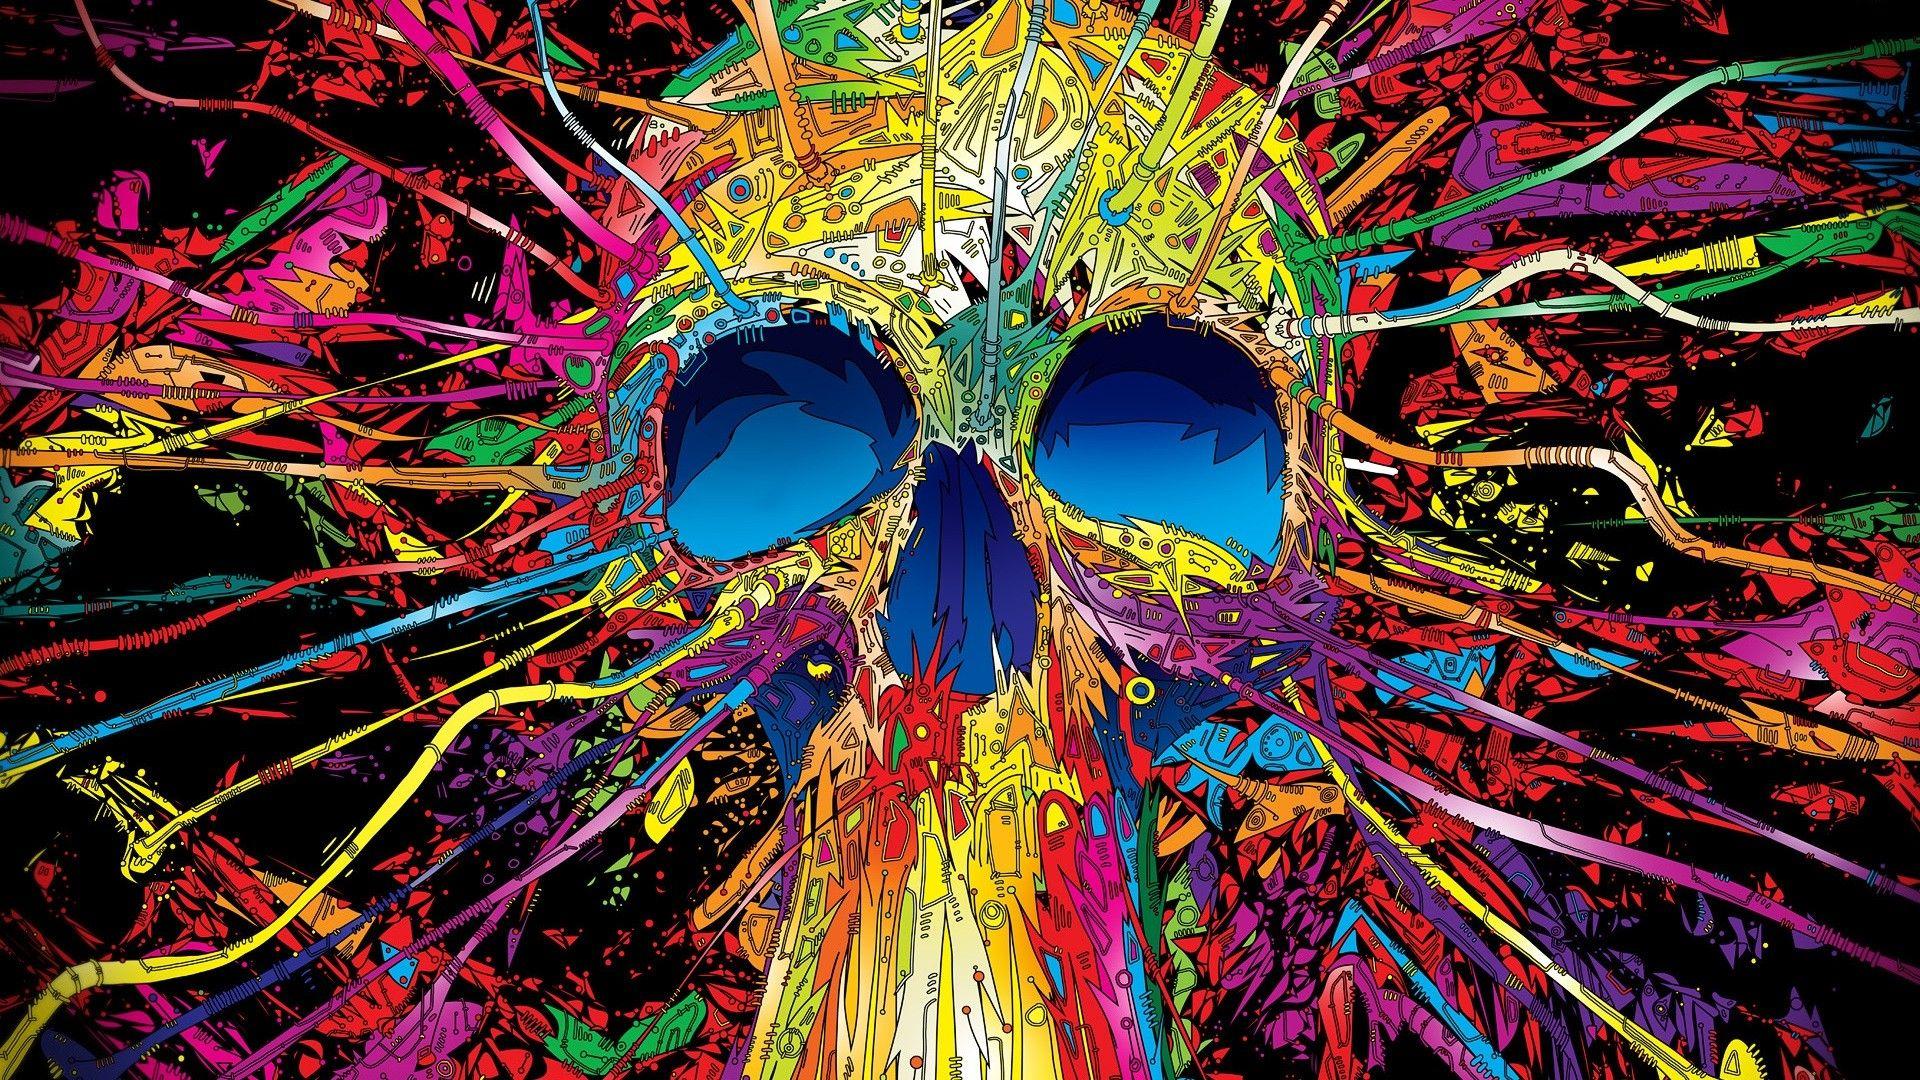 Art Desktop Backgrounds | deskbg.com | arts | Skull art, Skull wallpaper, Psychedelic Art